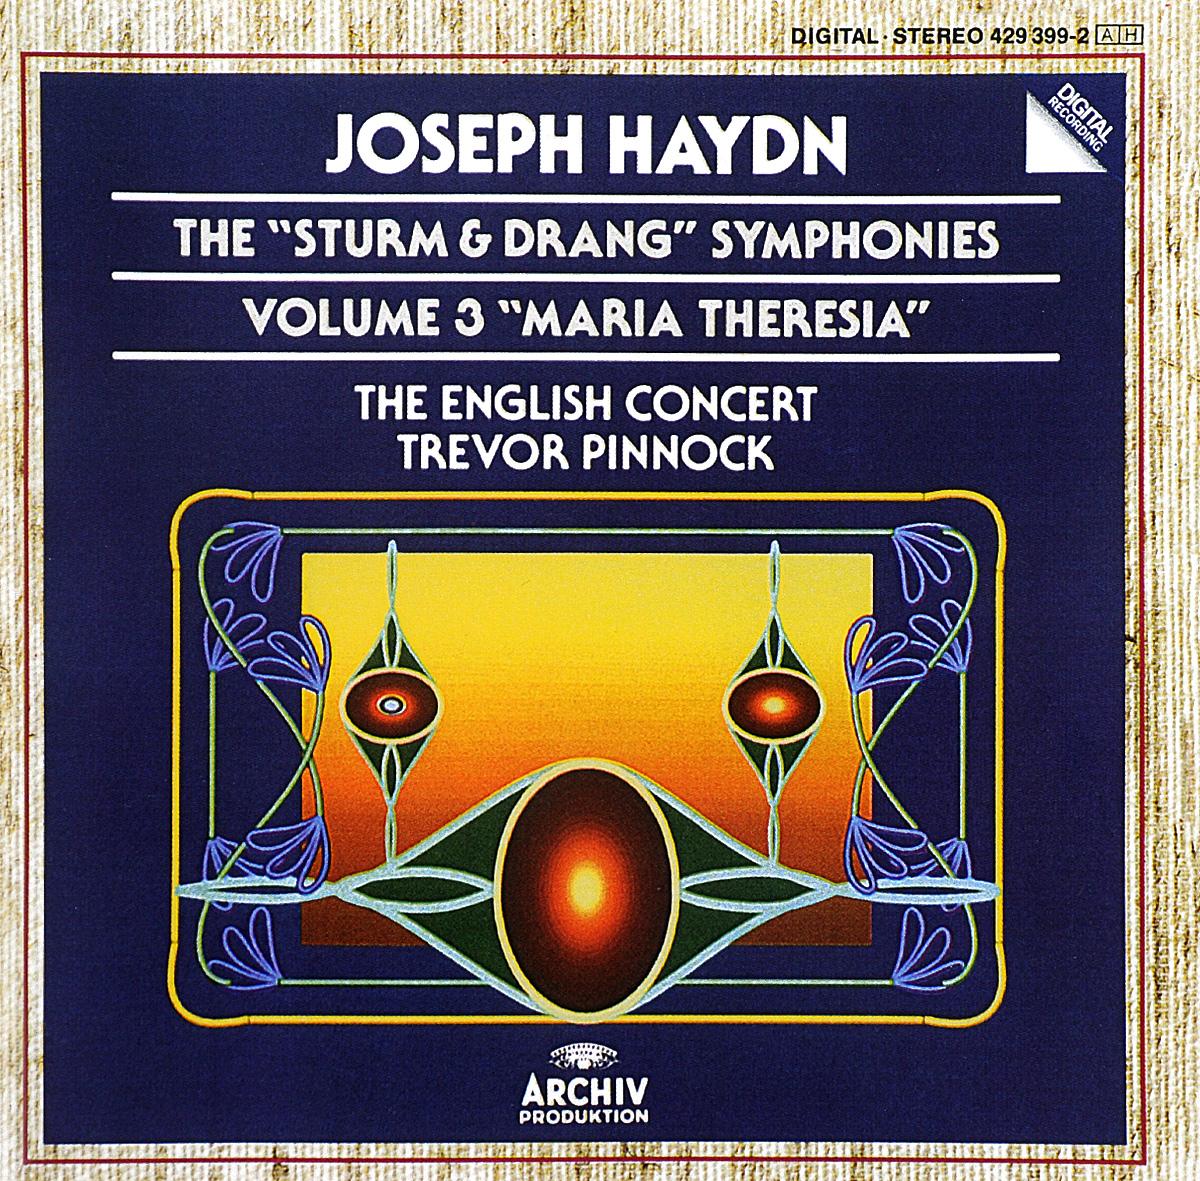 The English Concert,Тревор Пиннок Trevor Pinnock. Joseph Haydn. The Sturm & Drang Symphonies. Volume 3. Maria Theresia jaan tepp maria theresia taaler